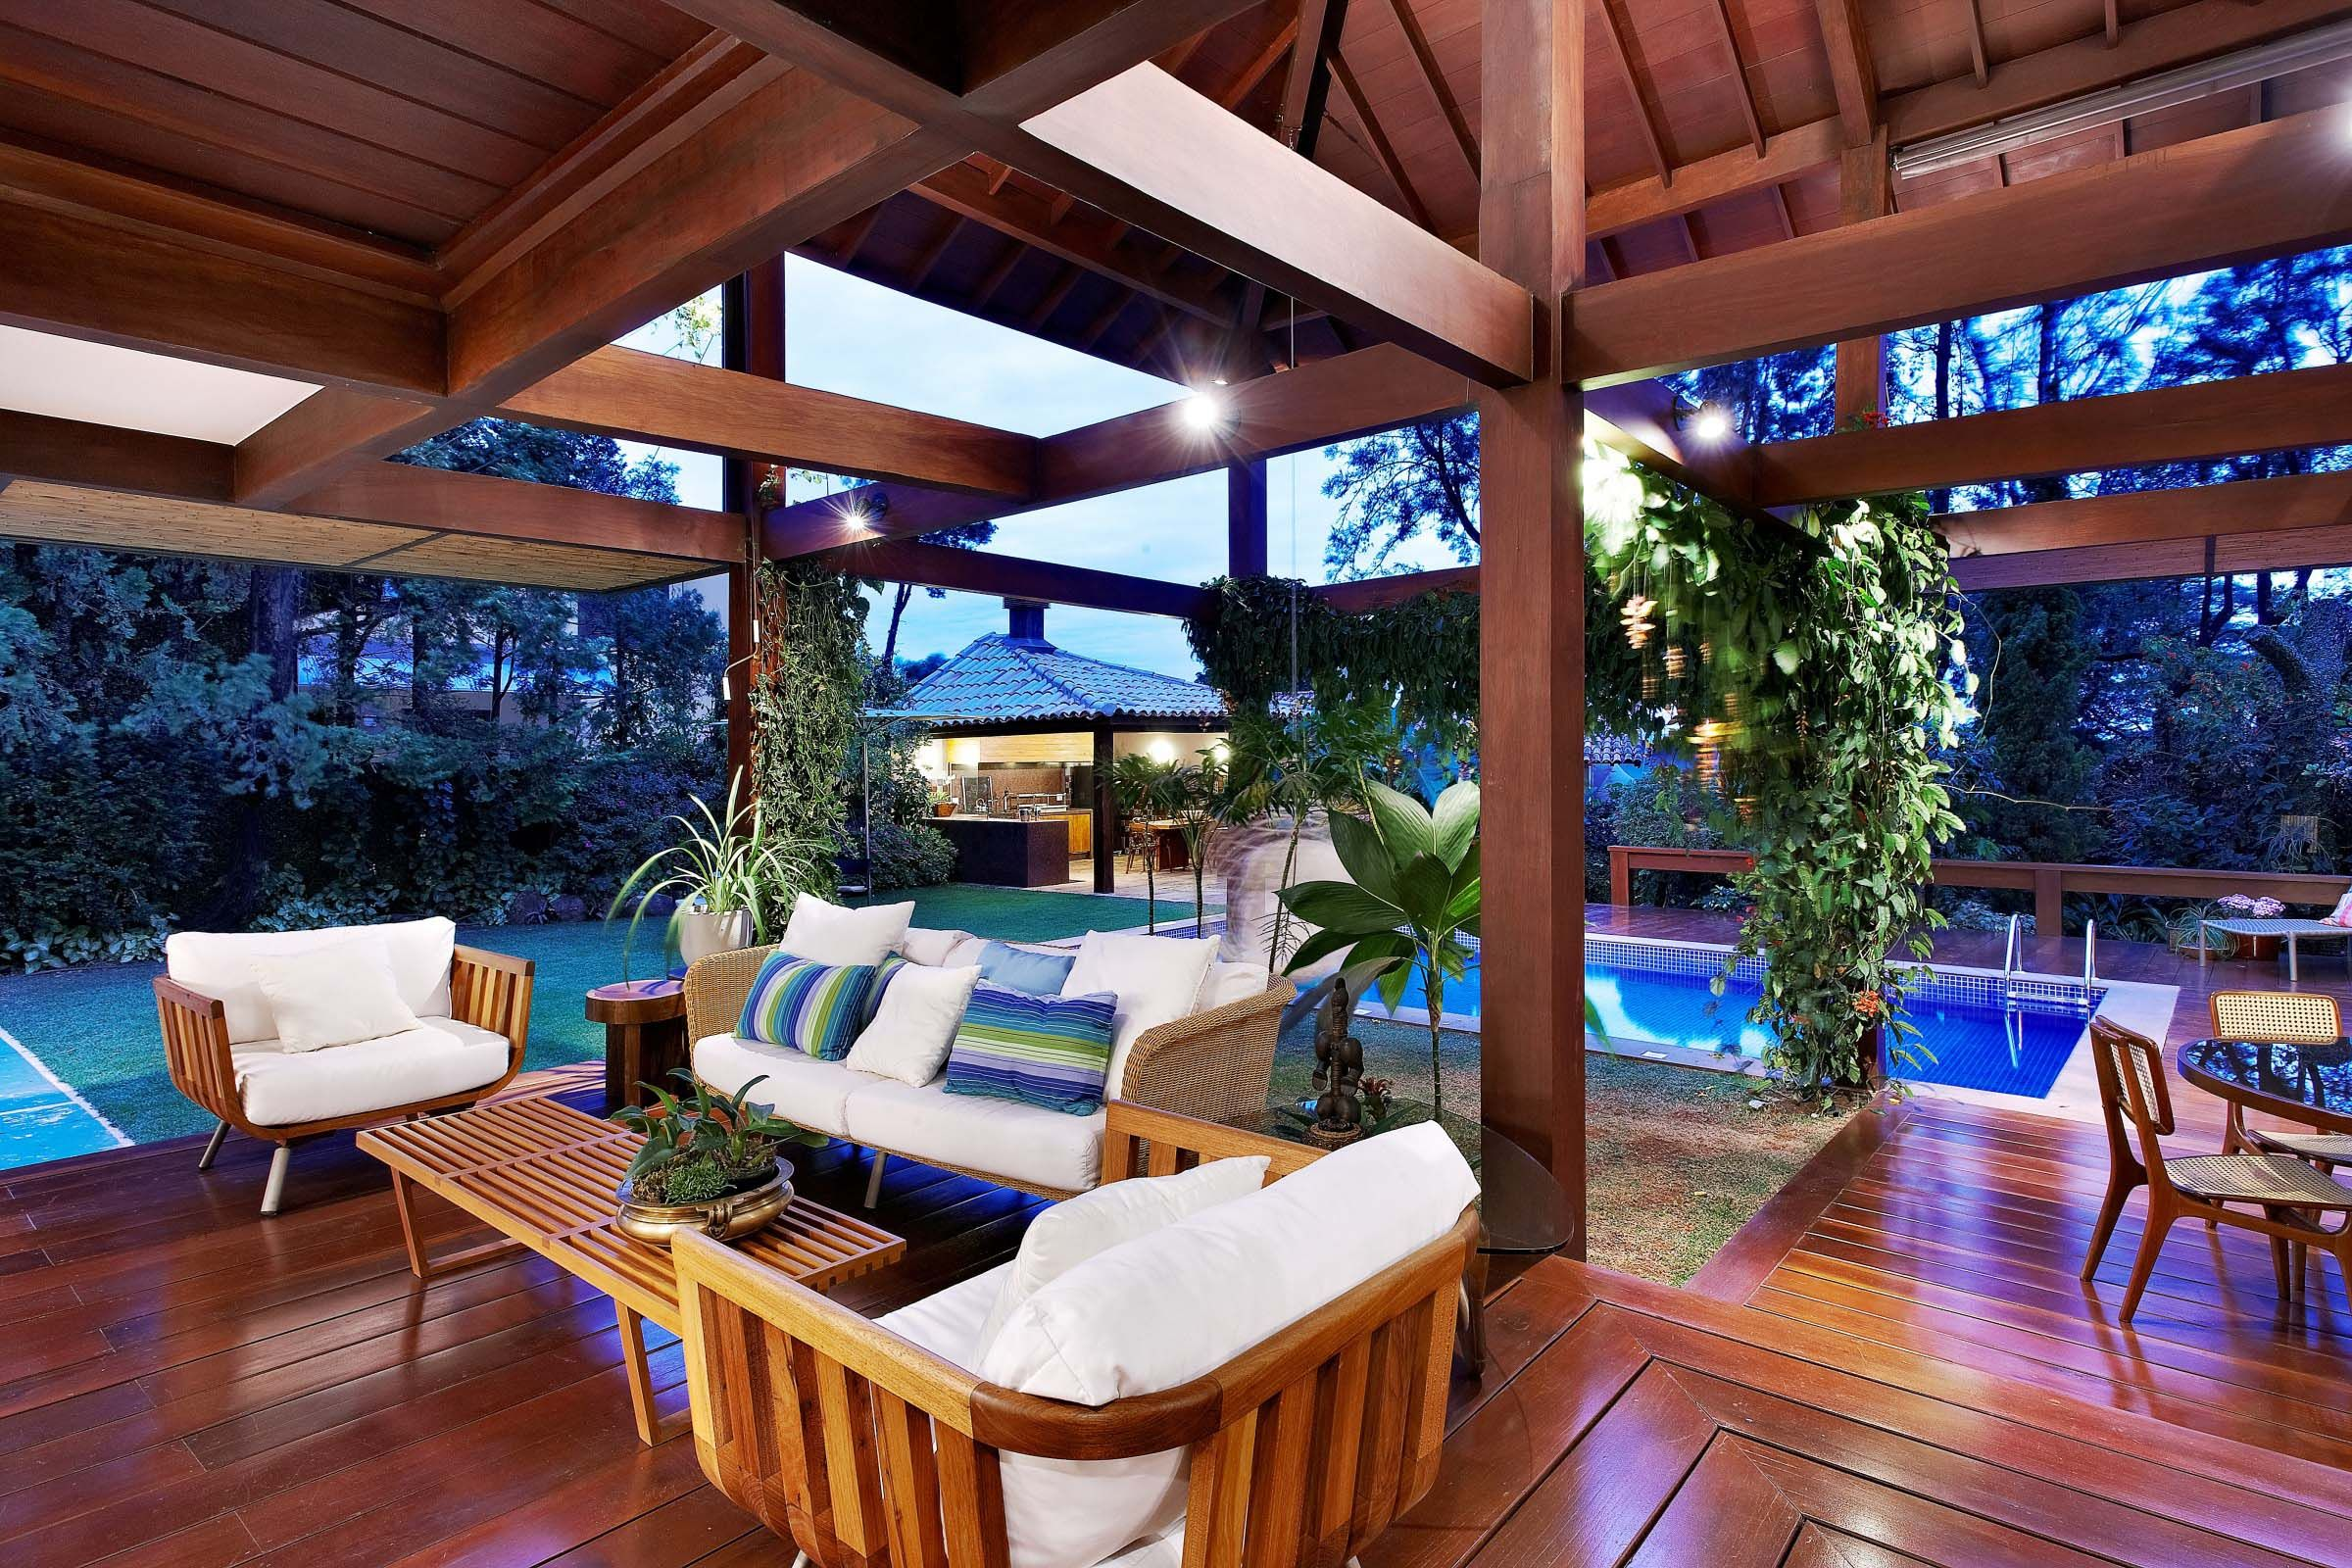 new defination of porch modern tropical house inspiration design